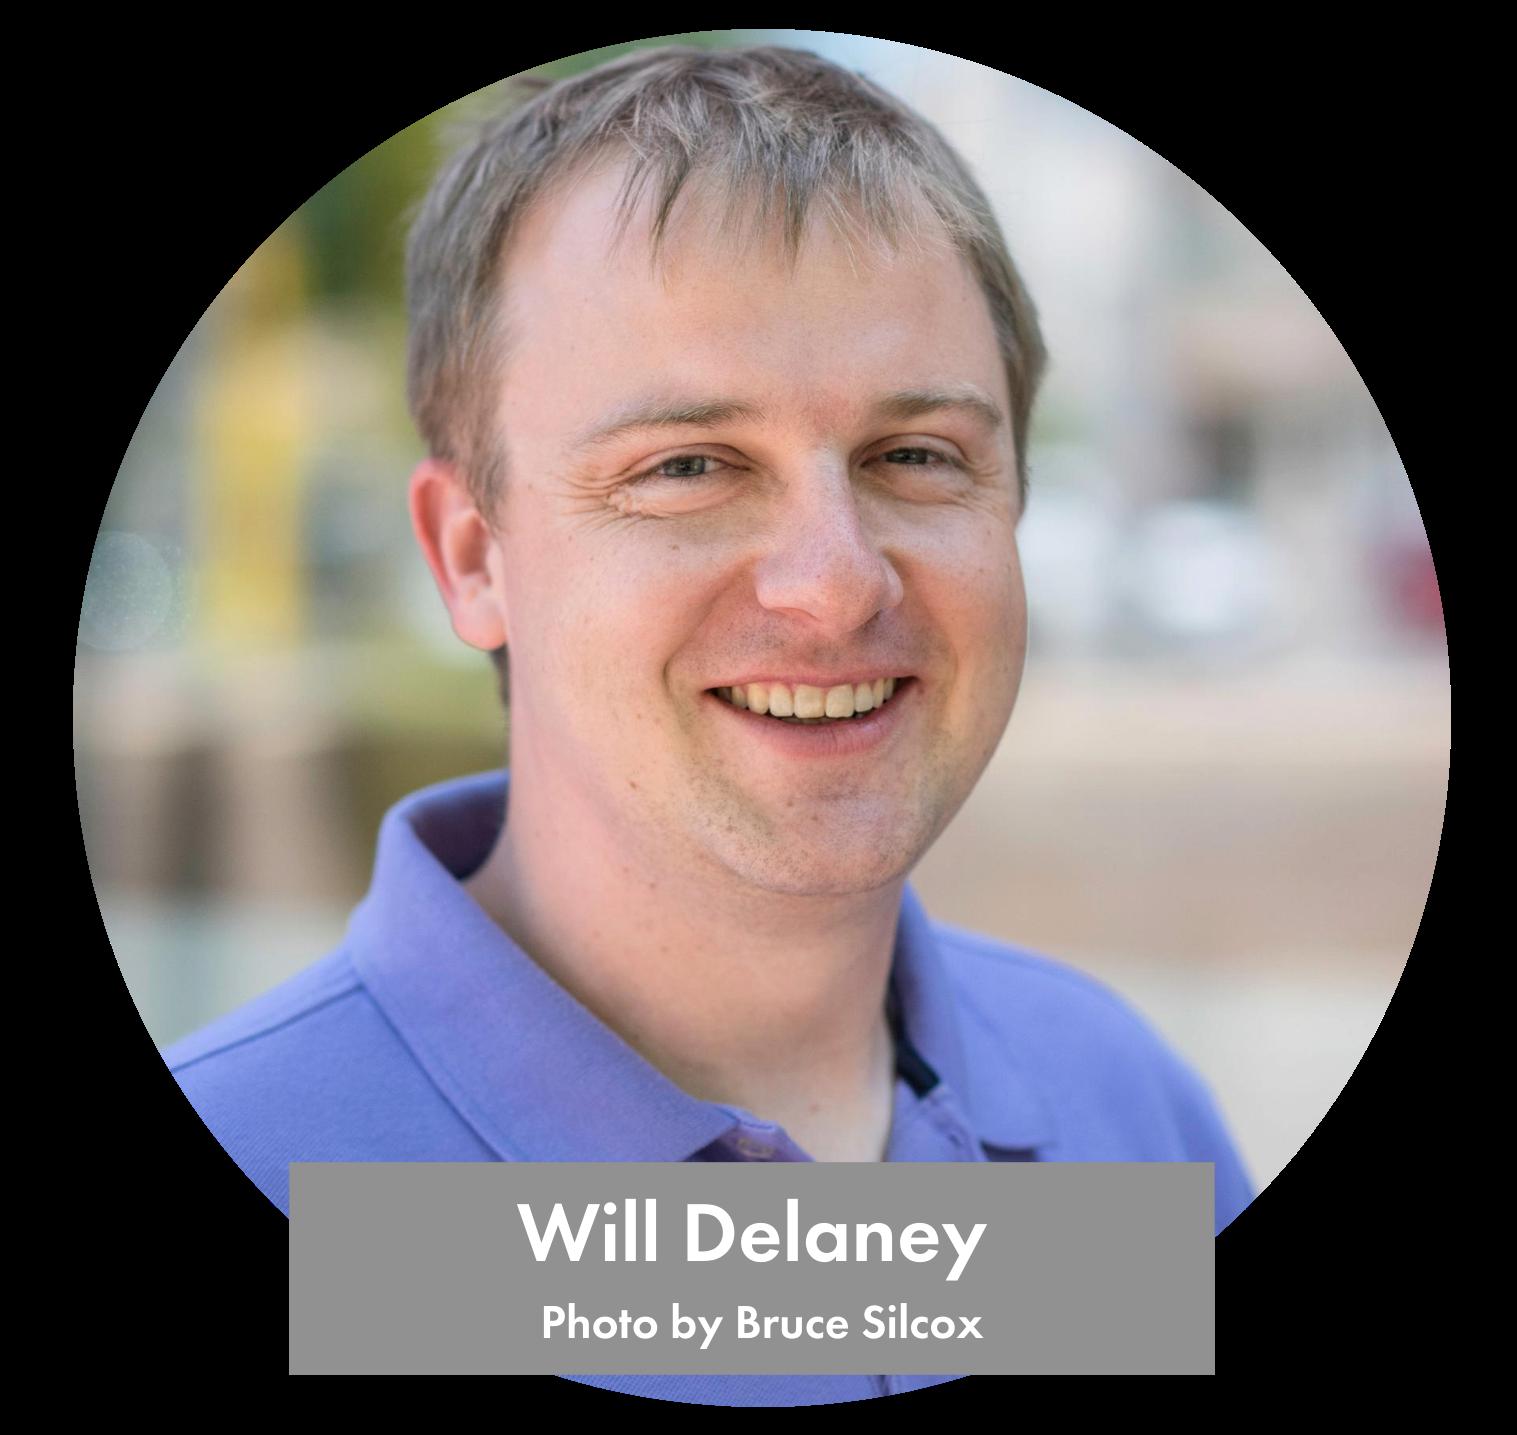 Will Delaney